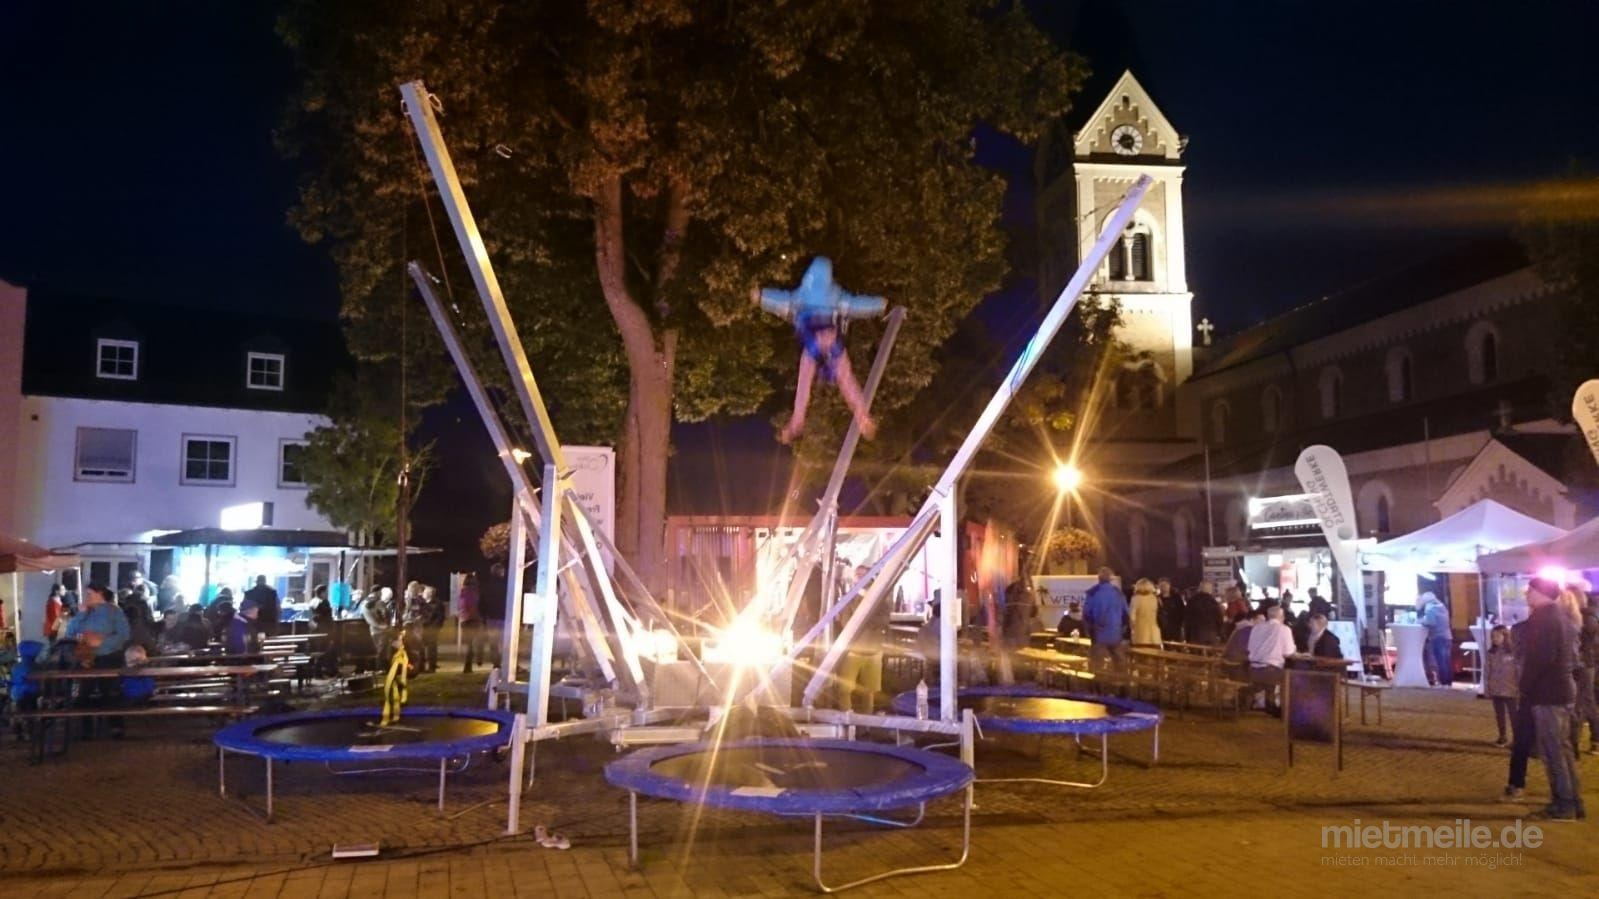 Bungee mieten & vermieten - 4er Bungeetrampolin zu vermieten in Naumburg